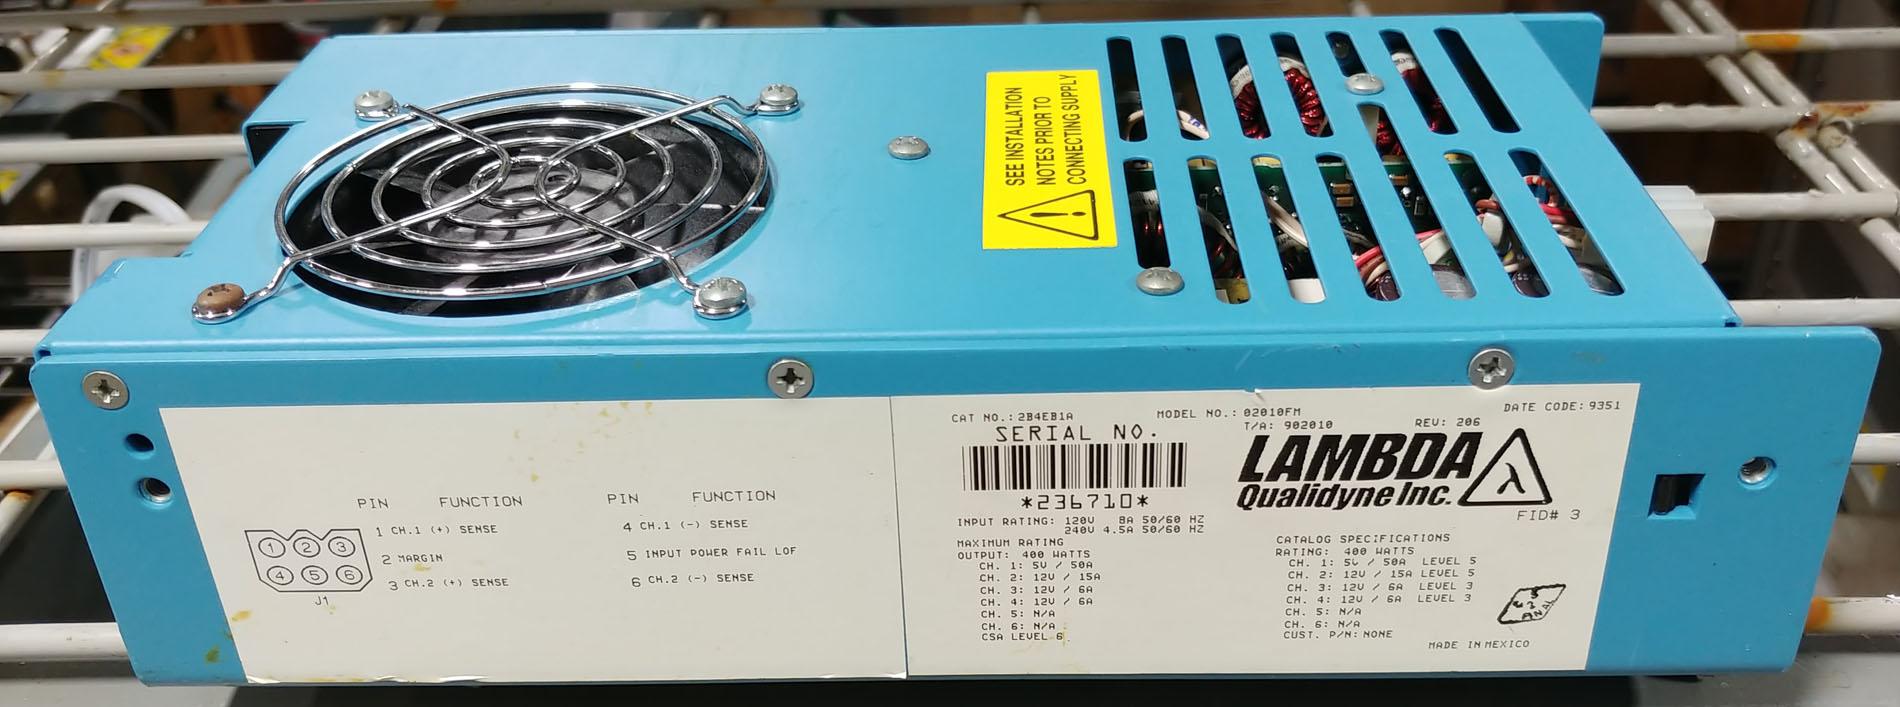 2B4EB1A LAMBDA : Spare Parts : XL-T